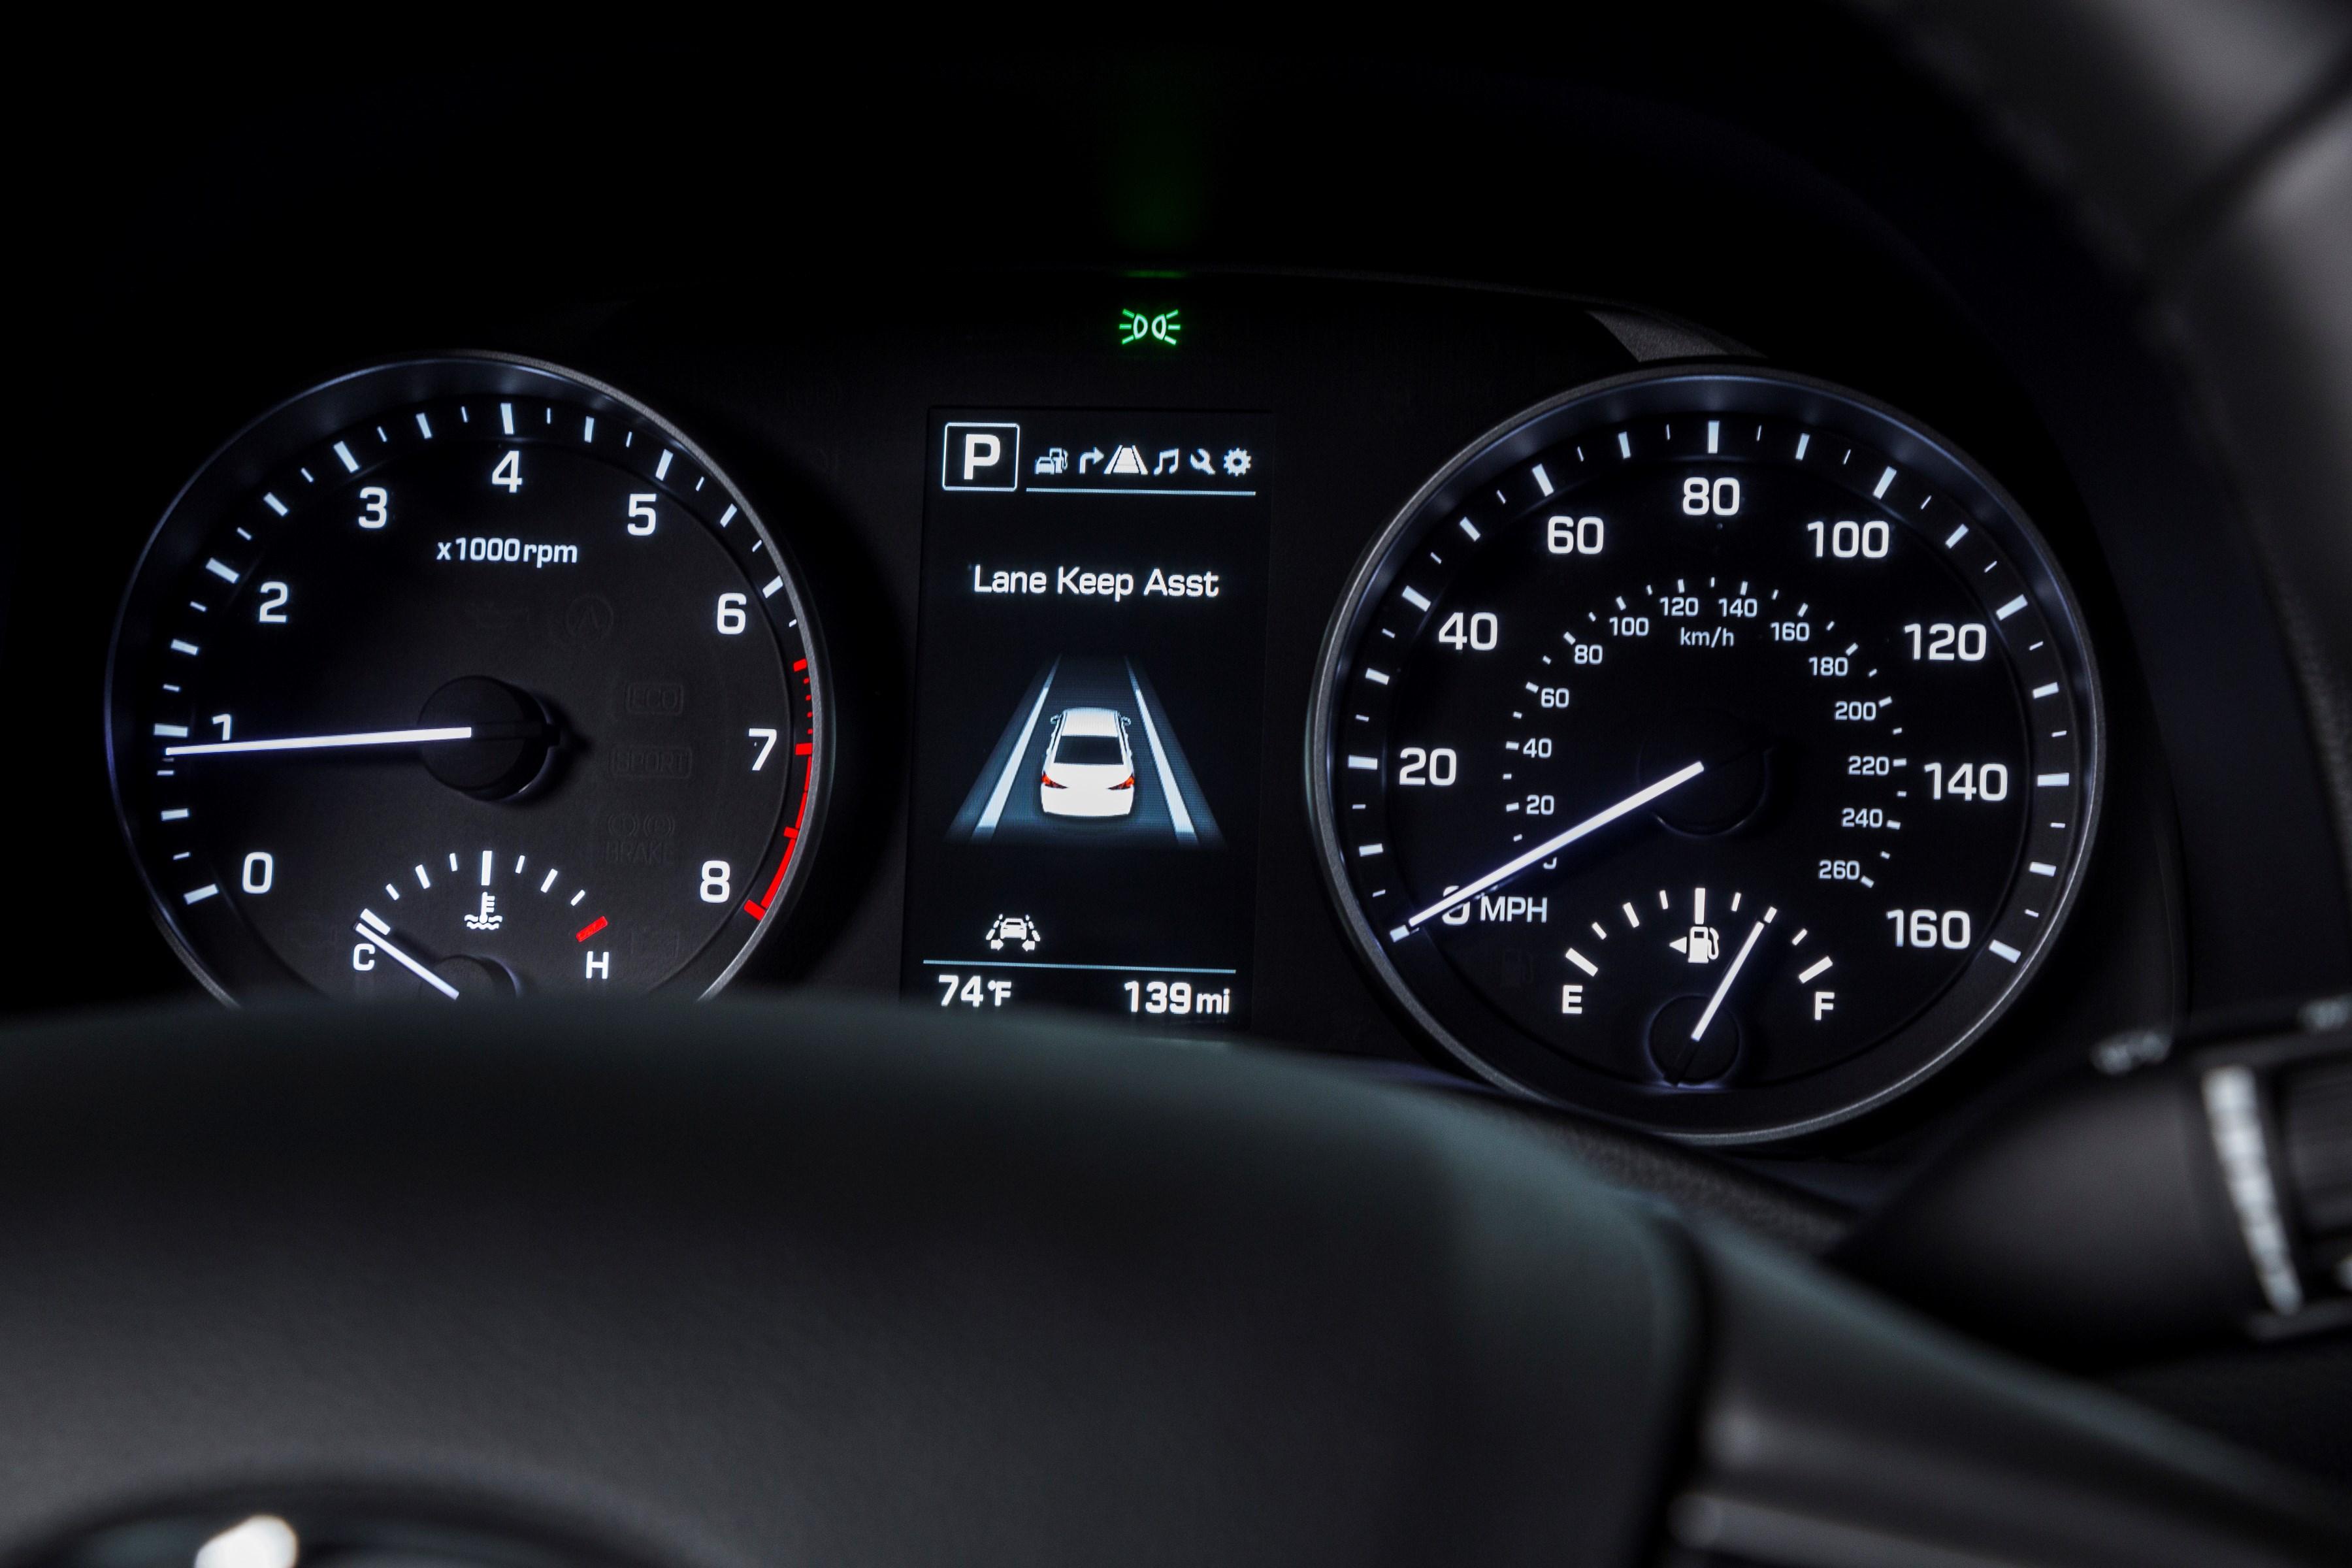 2017 Hyundai Elantra Gets New 1 4 Turbo 7 Speed Dct Paul